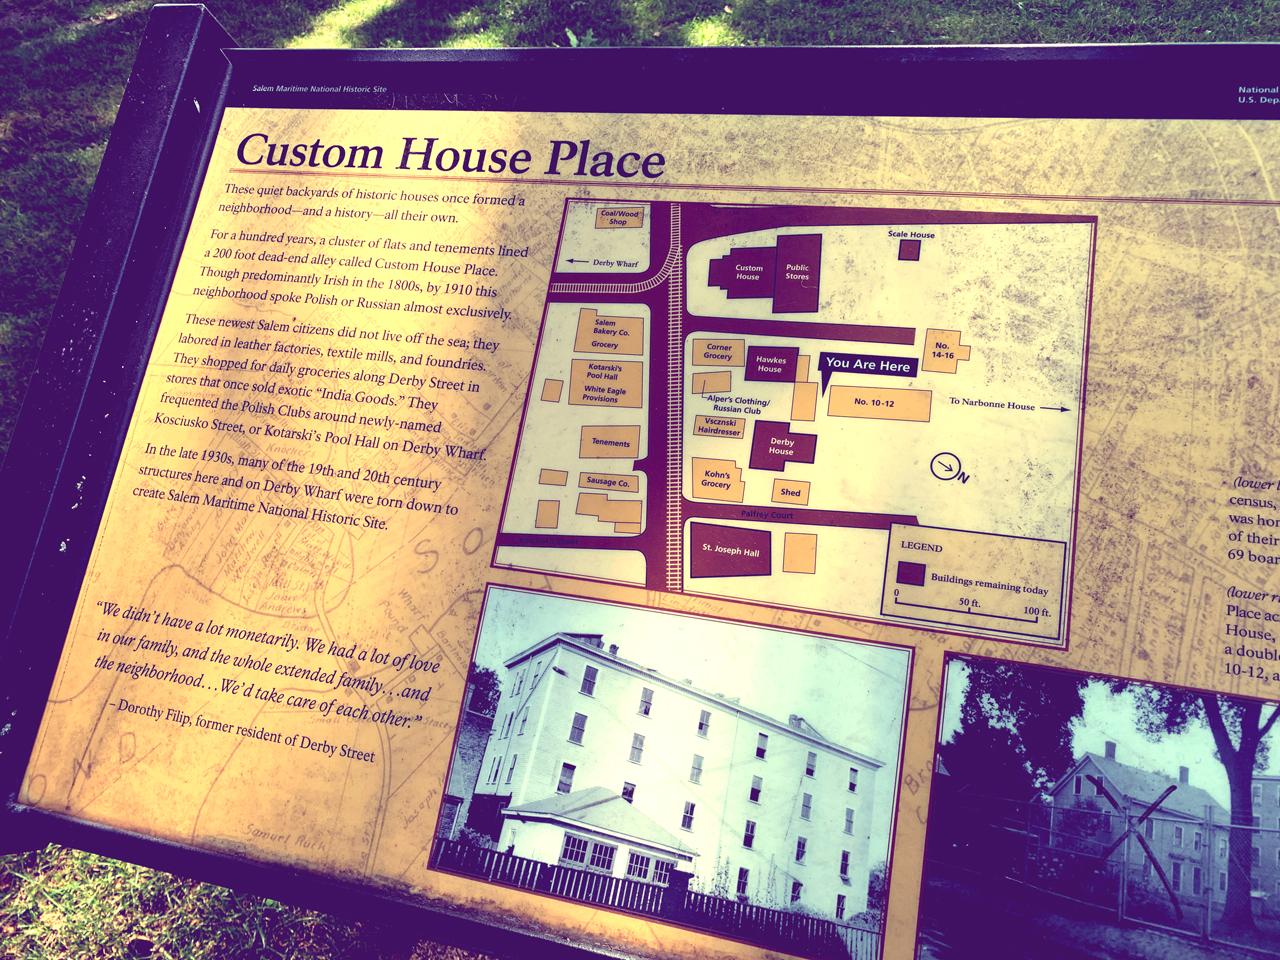 custom-house-salem-massachusetts-1280x960-07